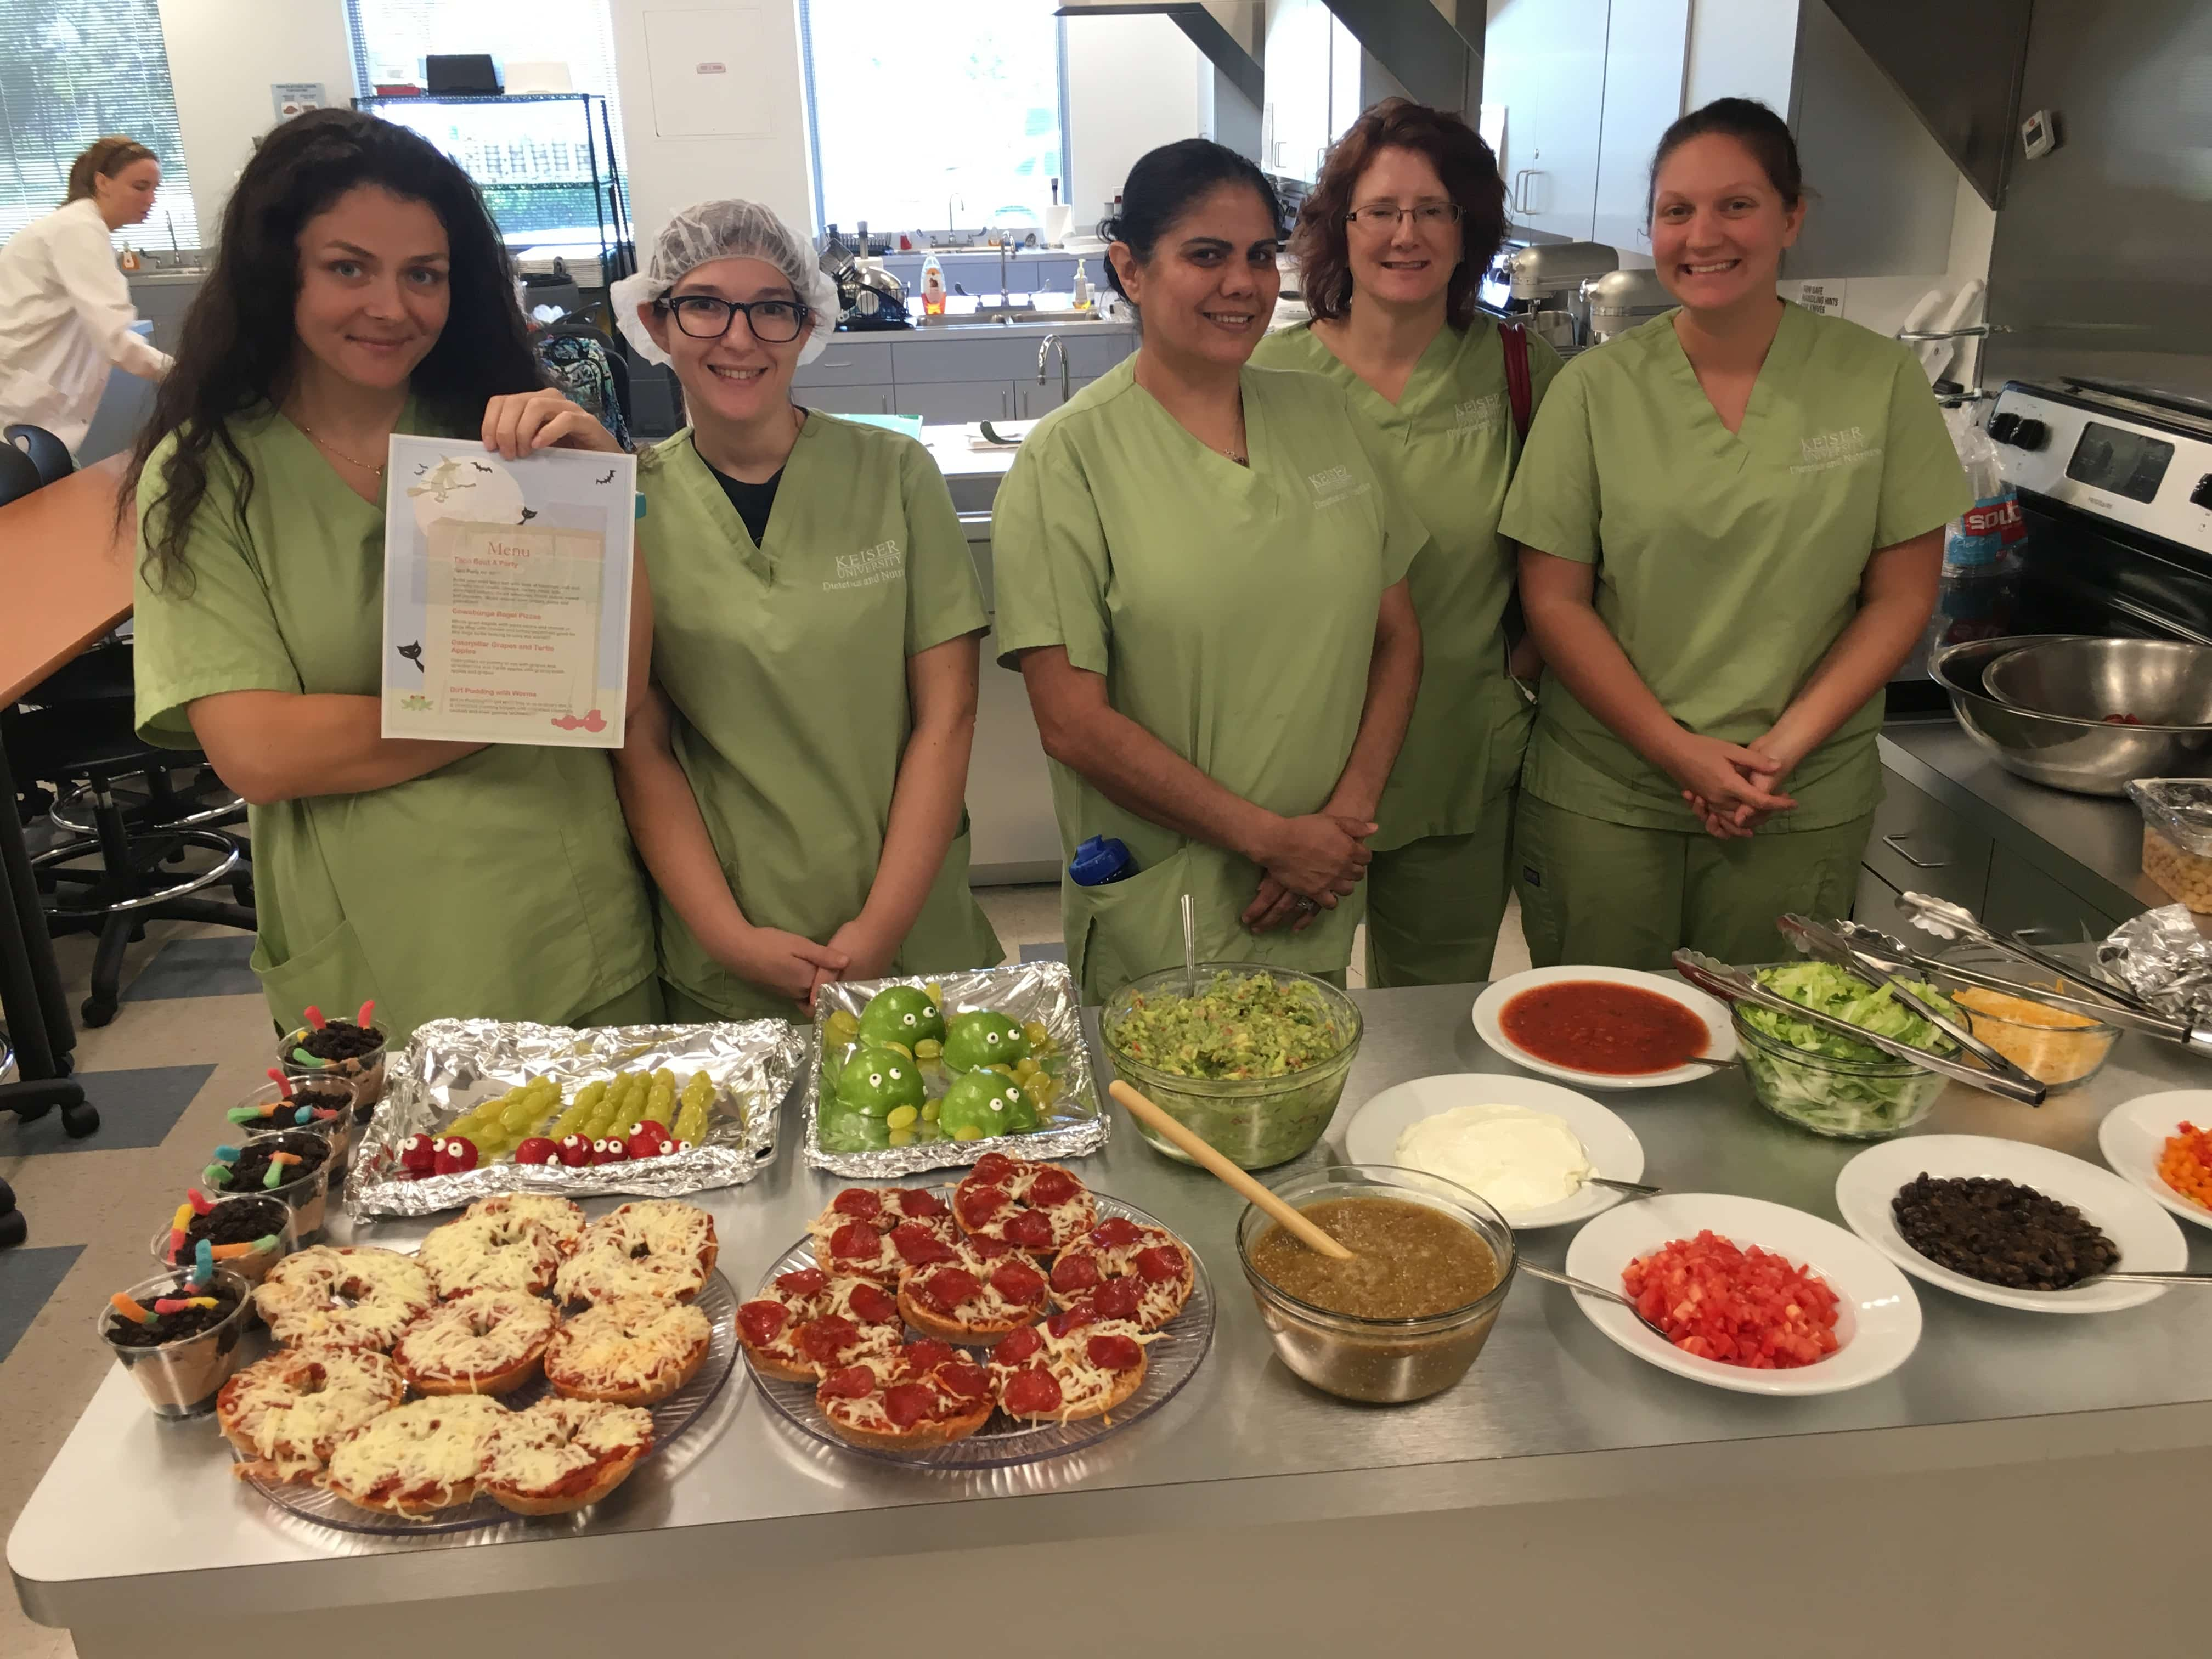 Dietetics & Nutrition Students Create Clinical Pediatric Menu Items